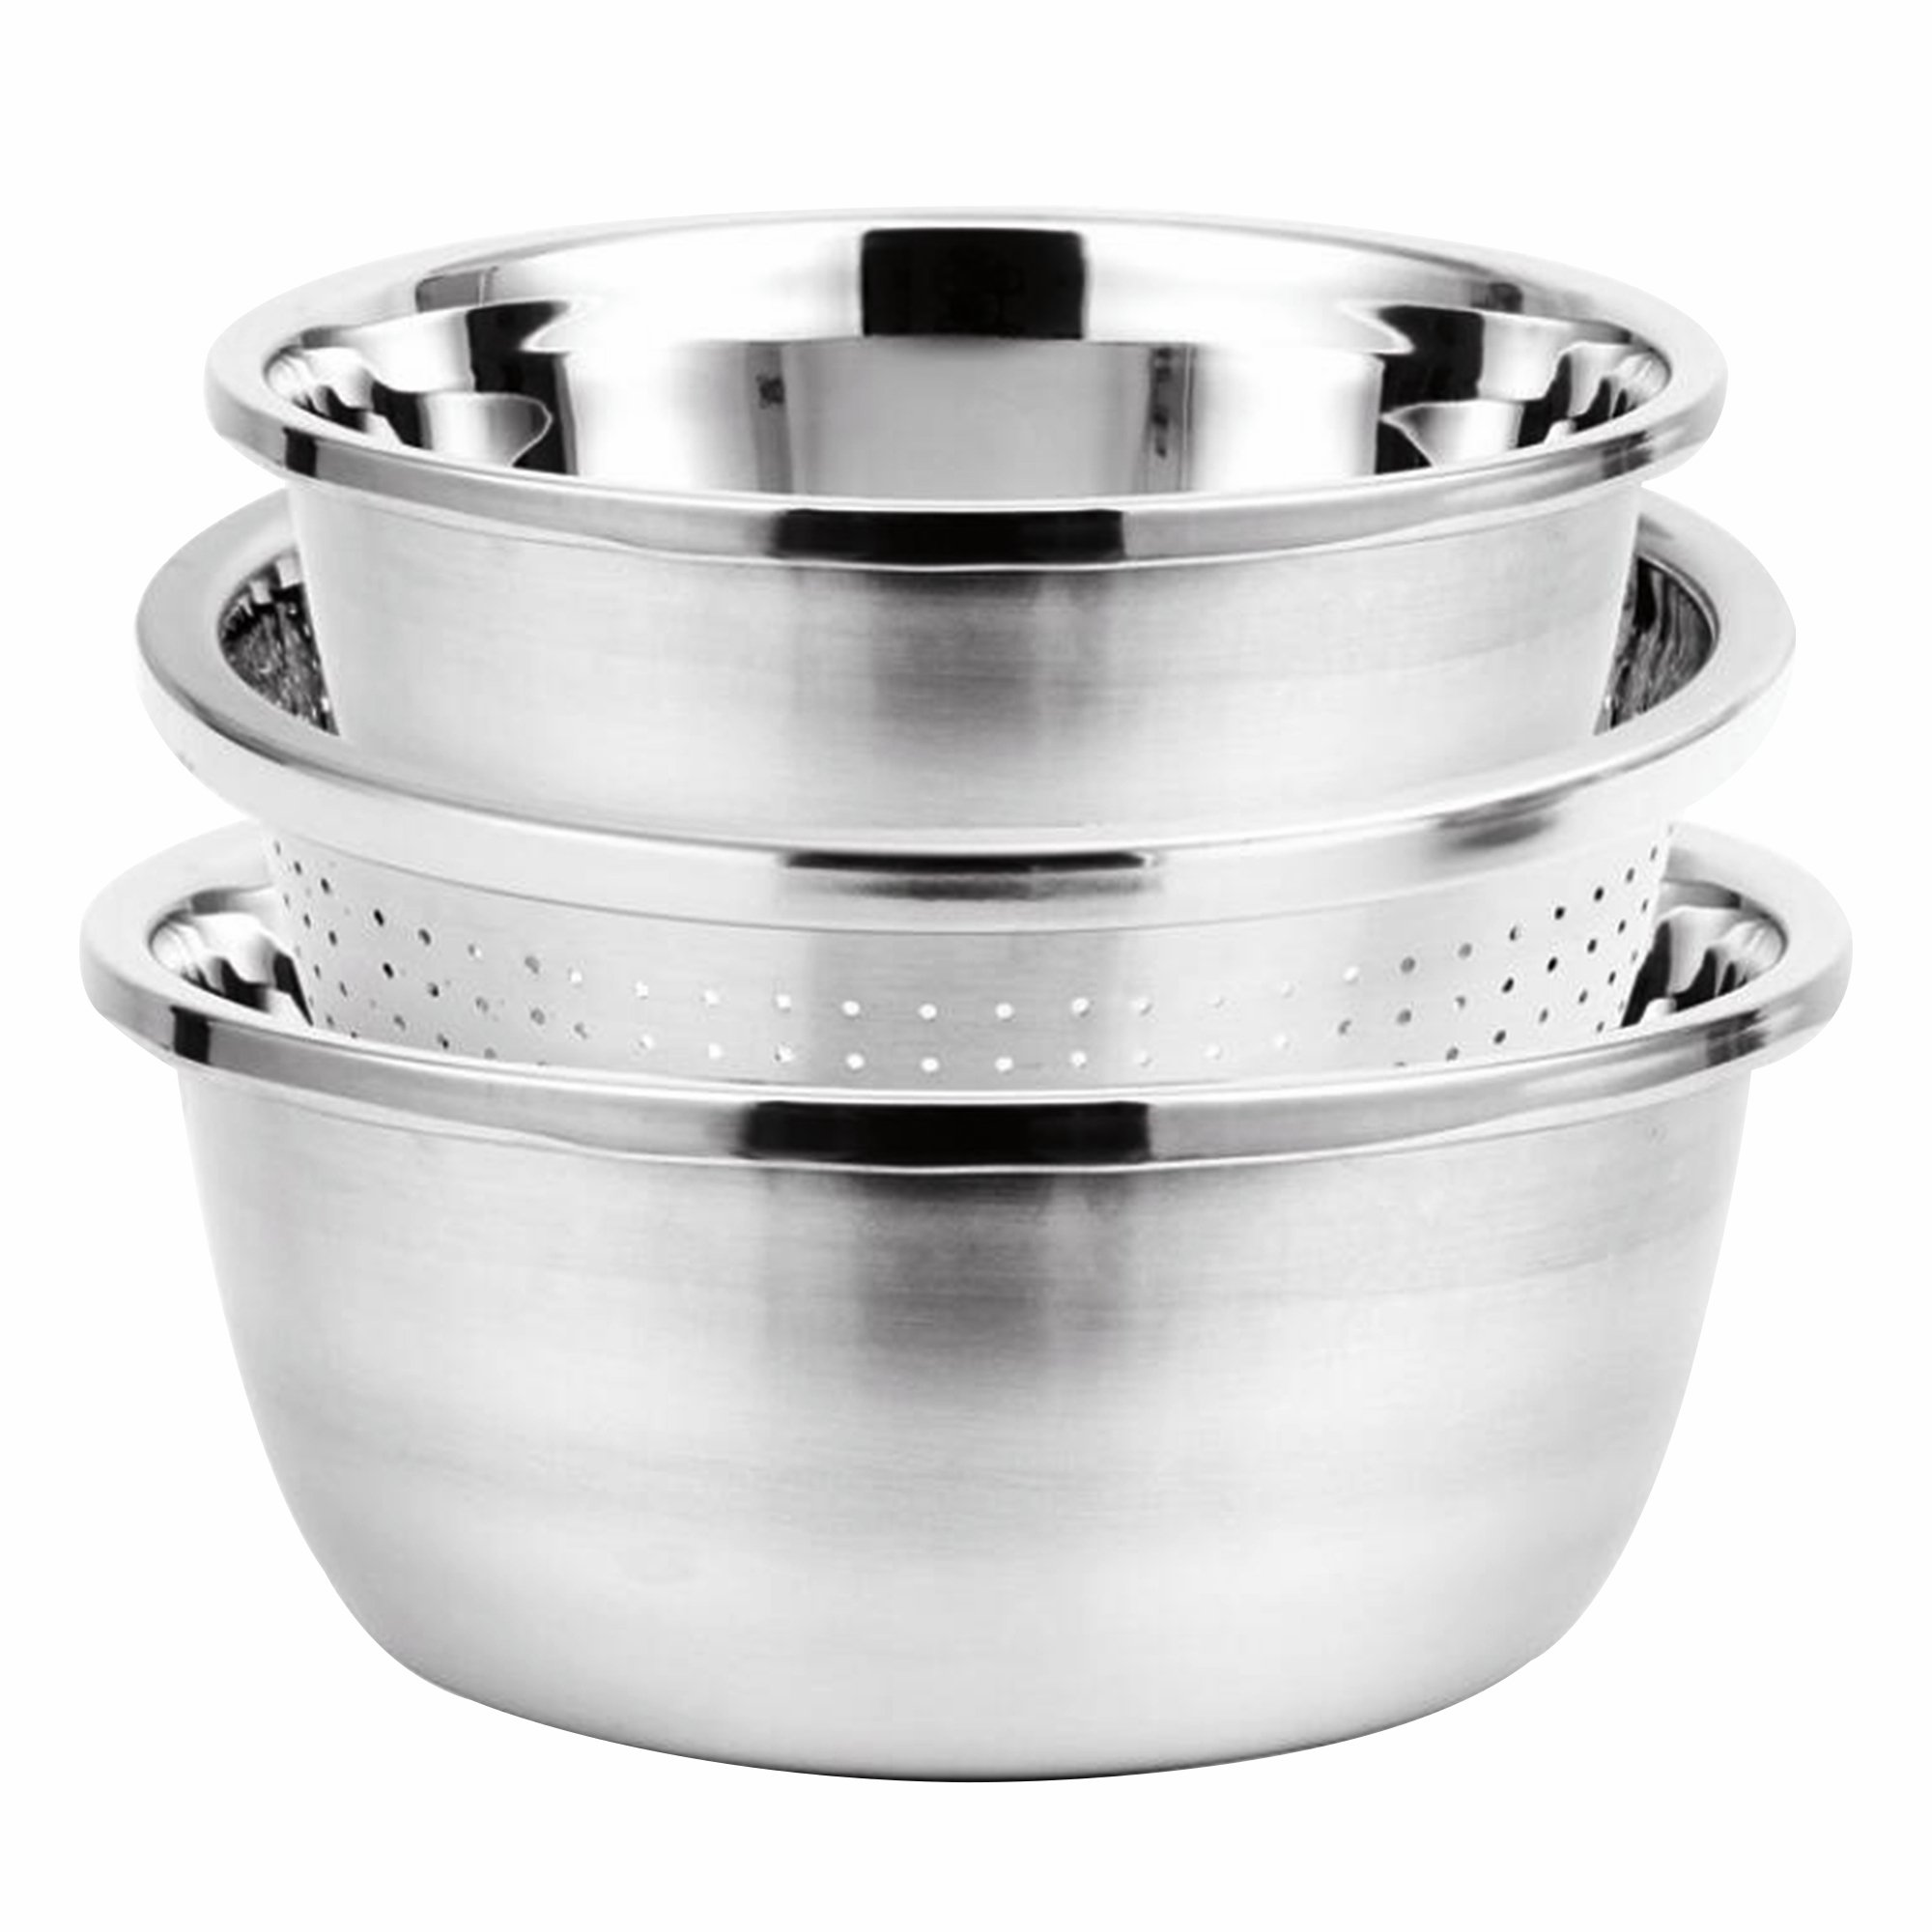 3Pcs Strainer Colander Mixing Bowl Set